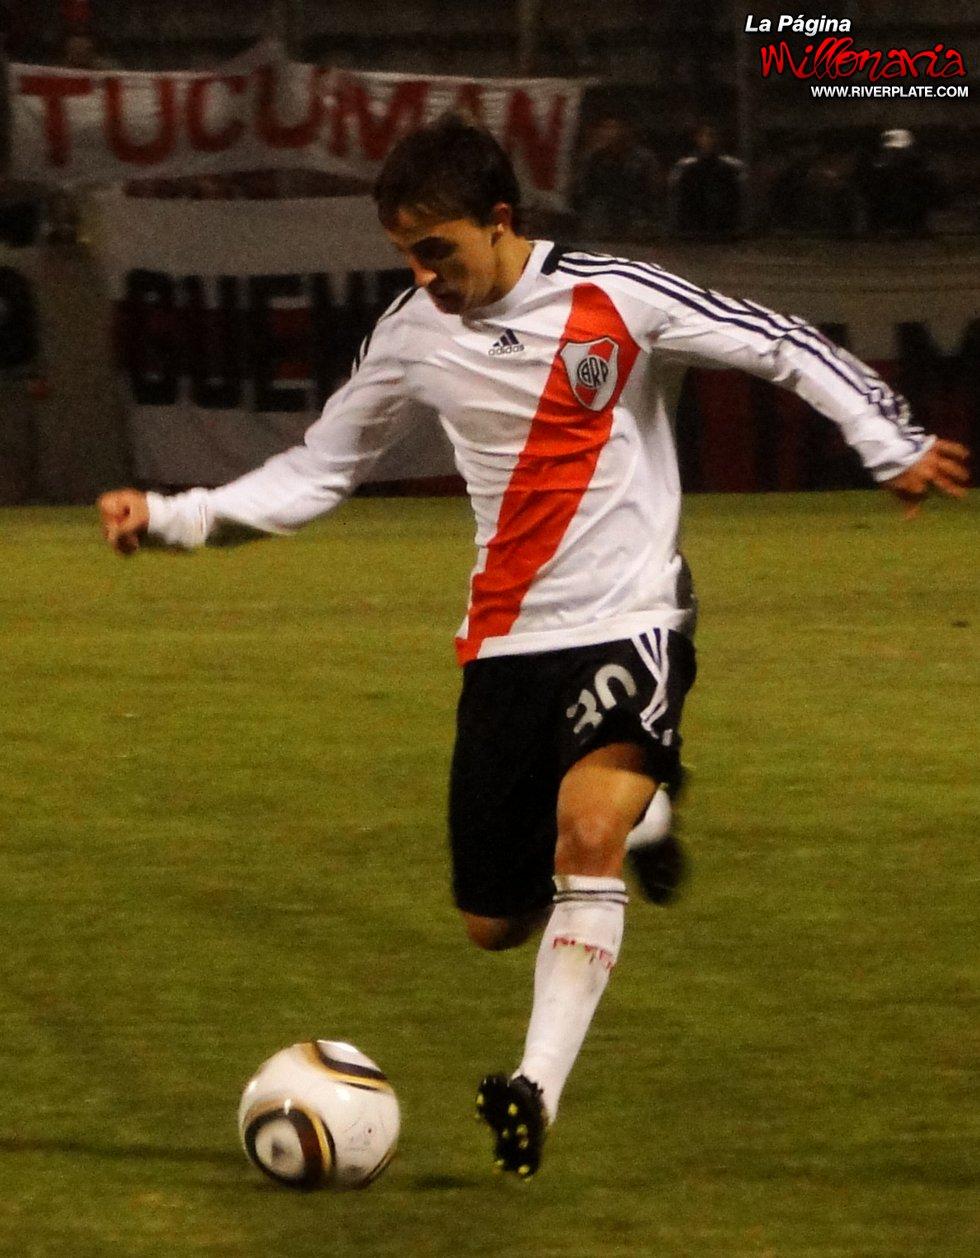 River Plate vs Gimnasia de Jujuy (Salta 2010) 87